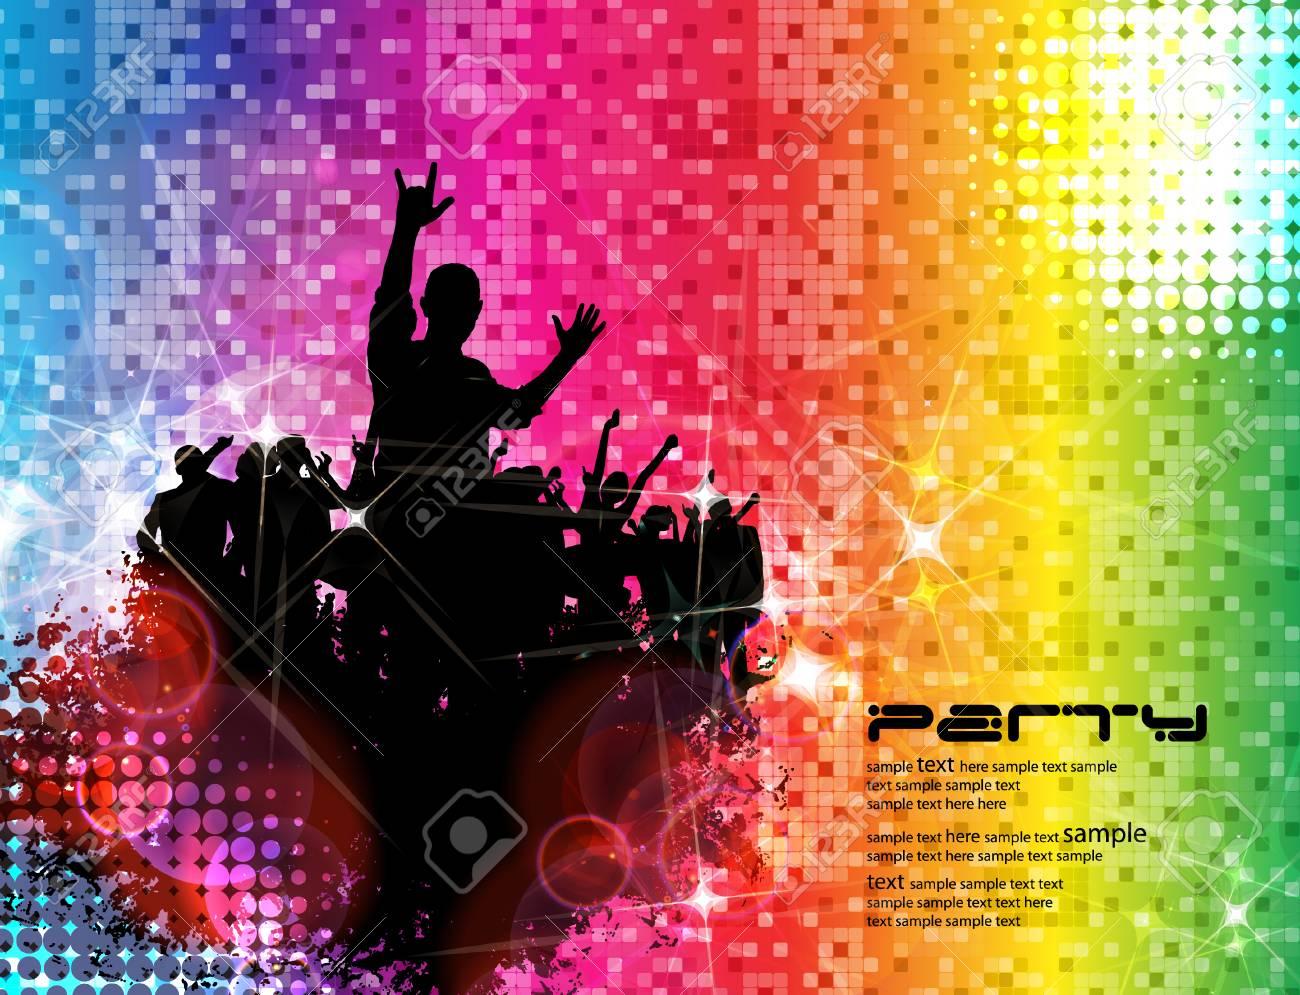 Music event background Vector eps10 illustration - 24385188